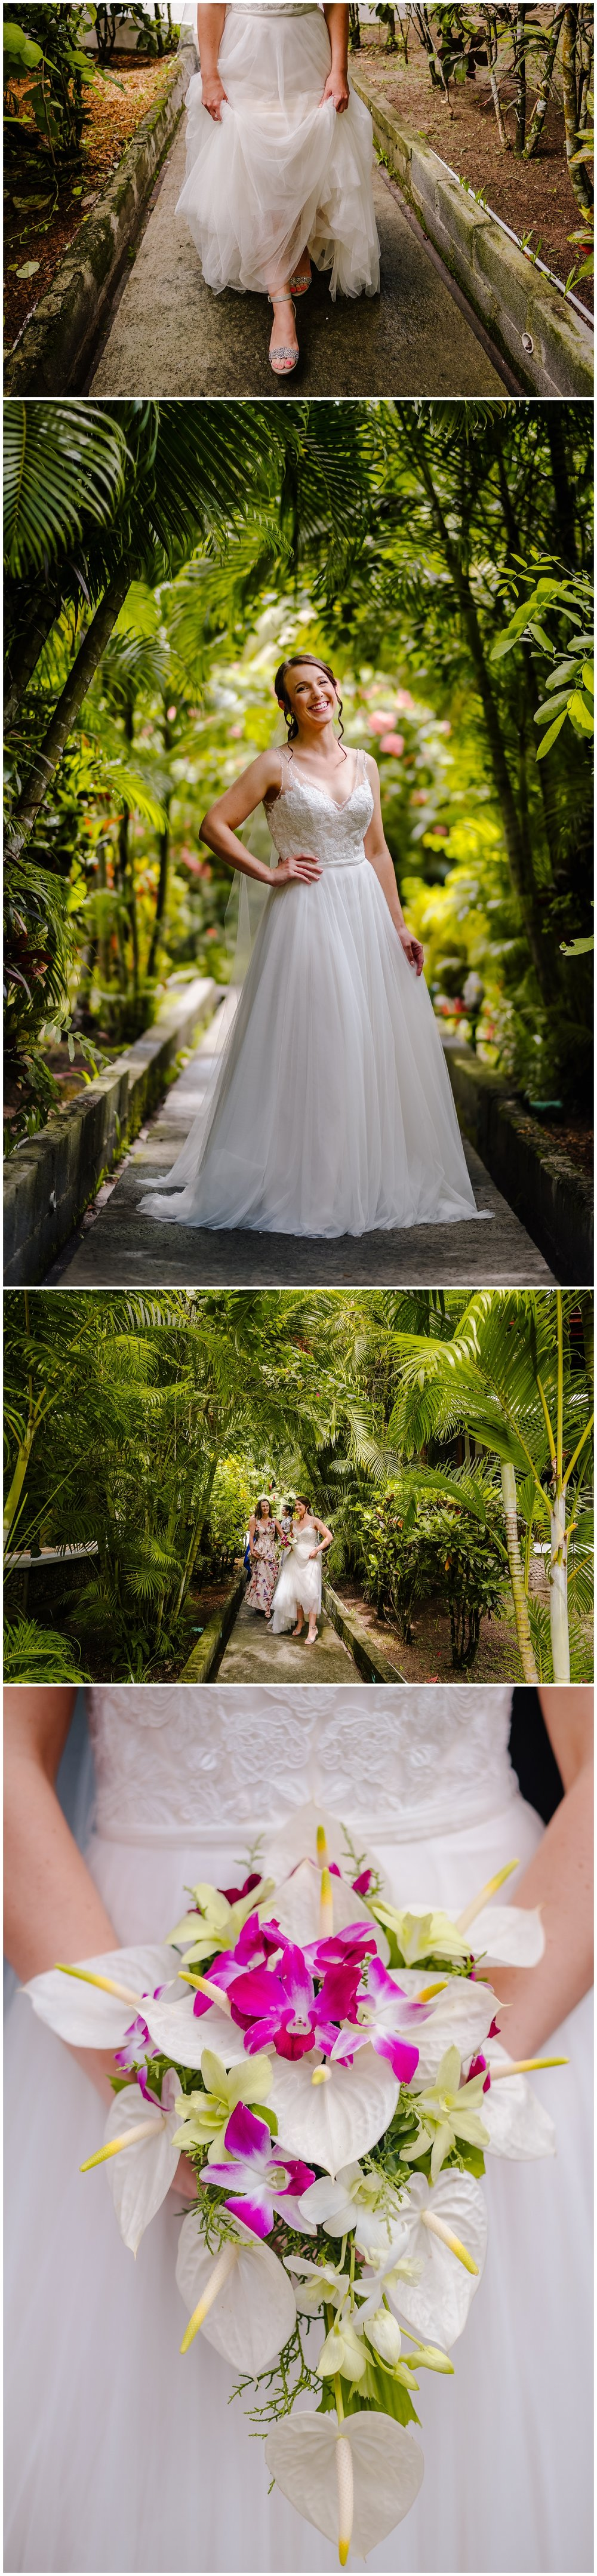 destination-wedding-photographer-st-lucia-black-sand-beaches_0023.jpg